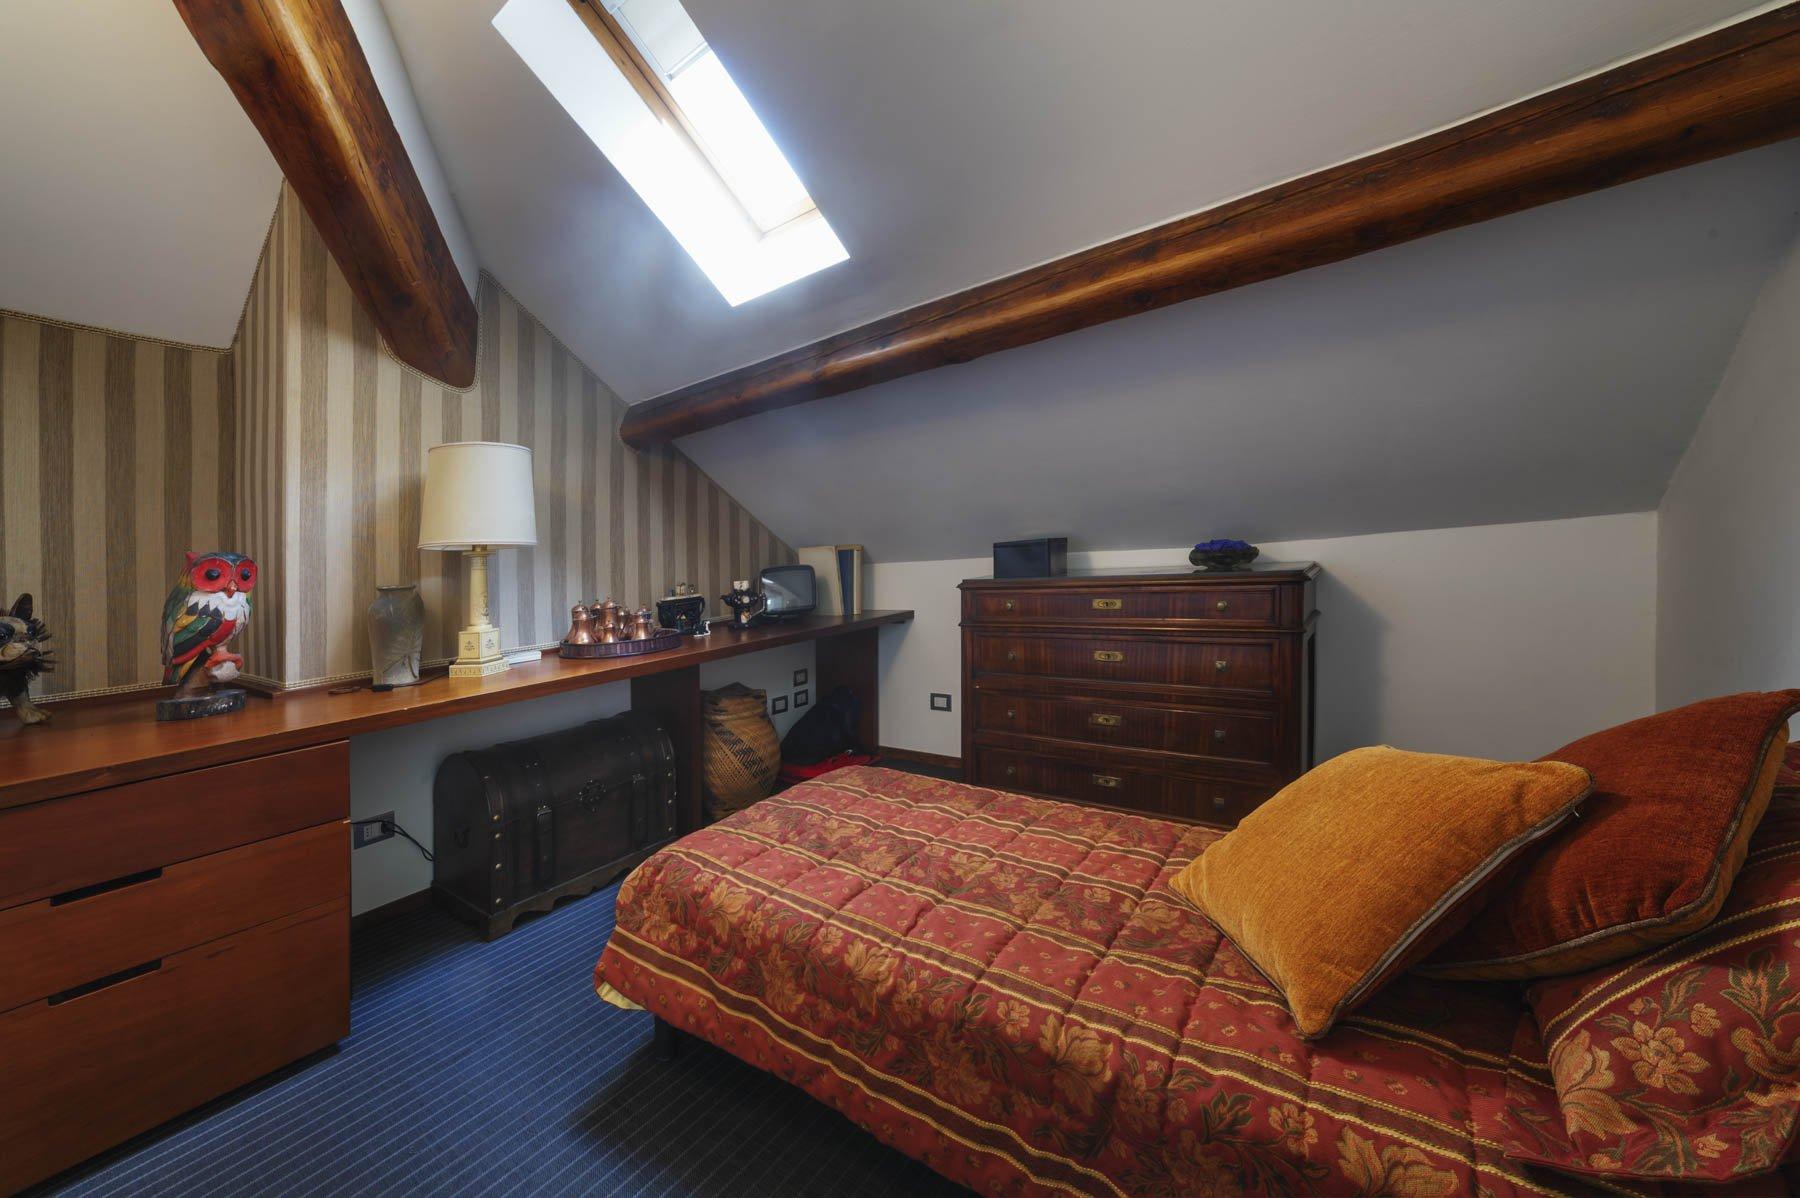 Apartment for sale in Baveno, inside a historic lake front villa . double bedroom in the attic